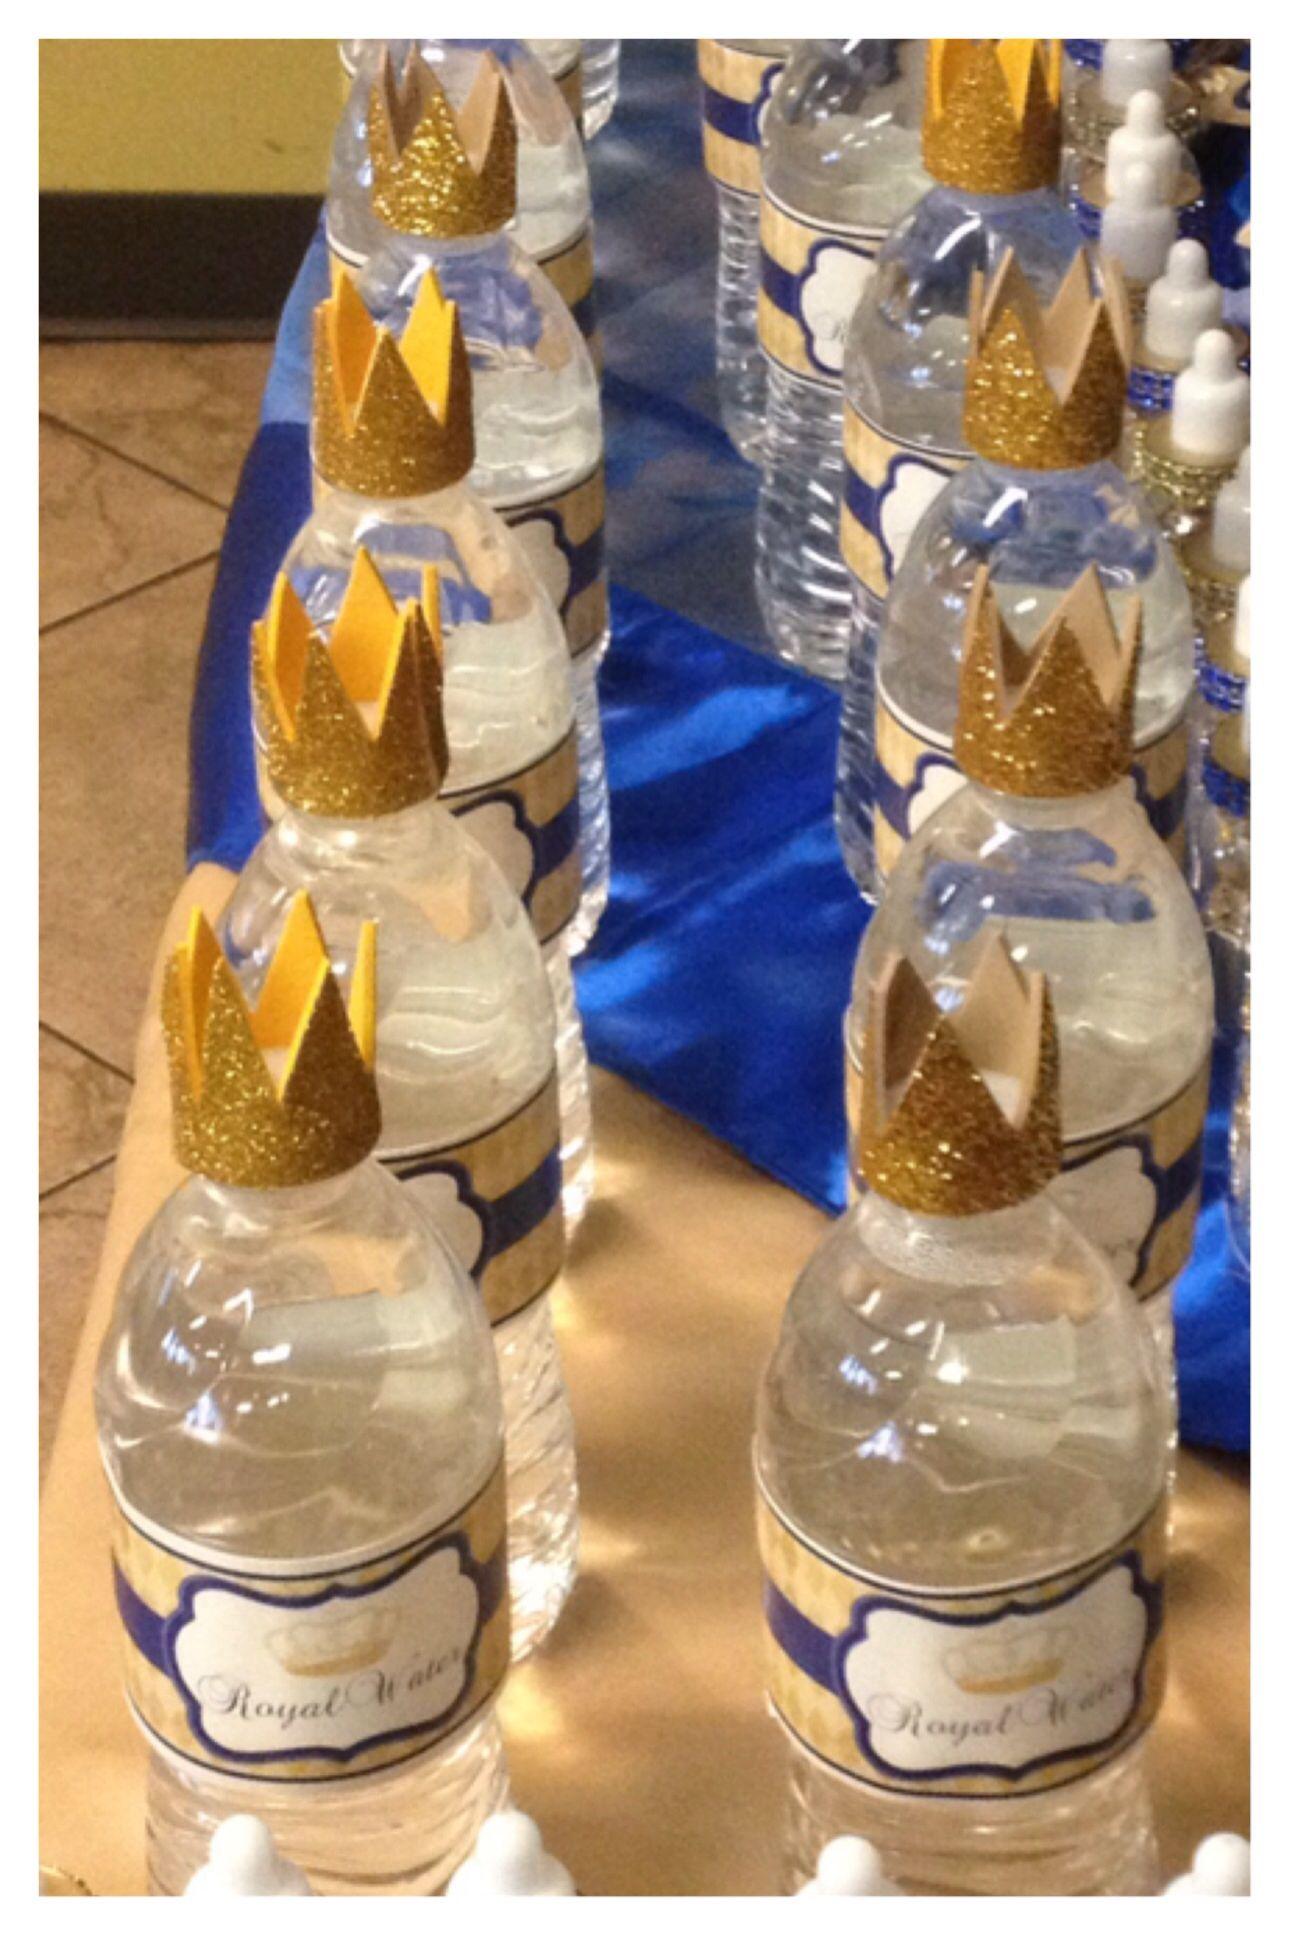 Royal Prince Baby Shower Theme Water Bottles!! DIY Self Cutout :) Super